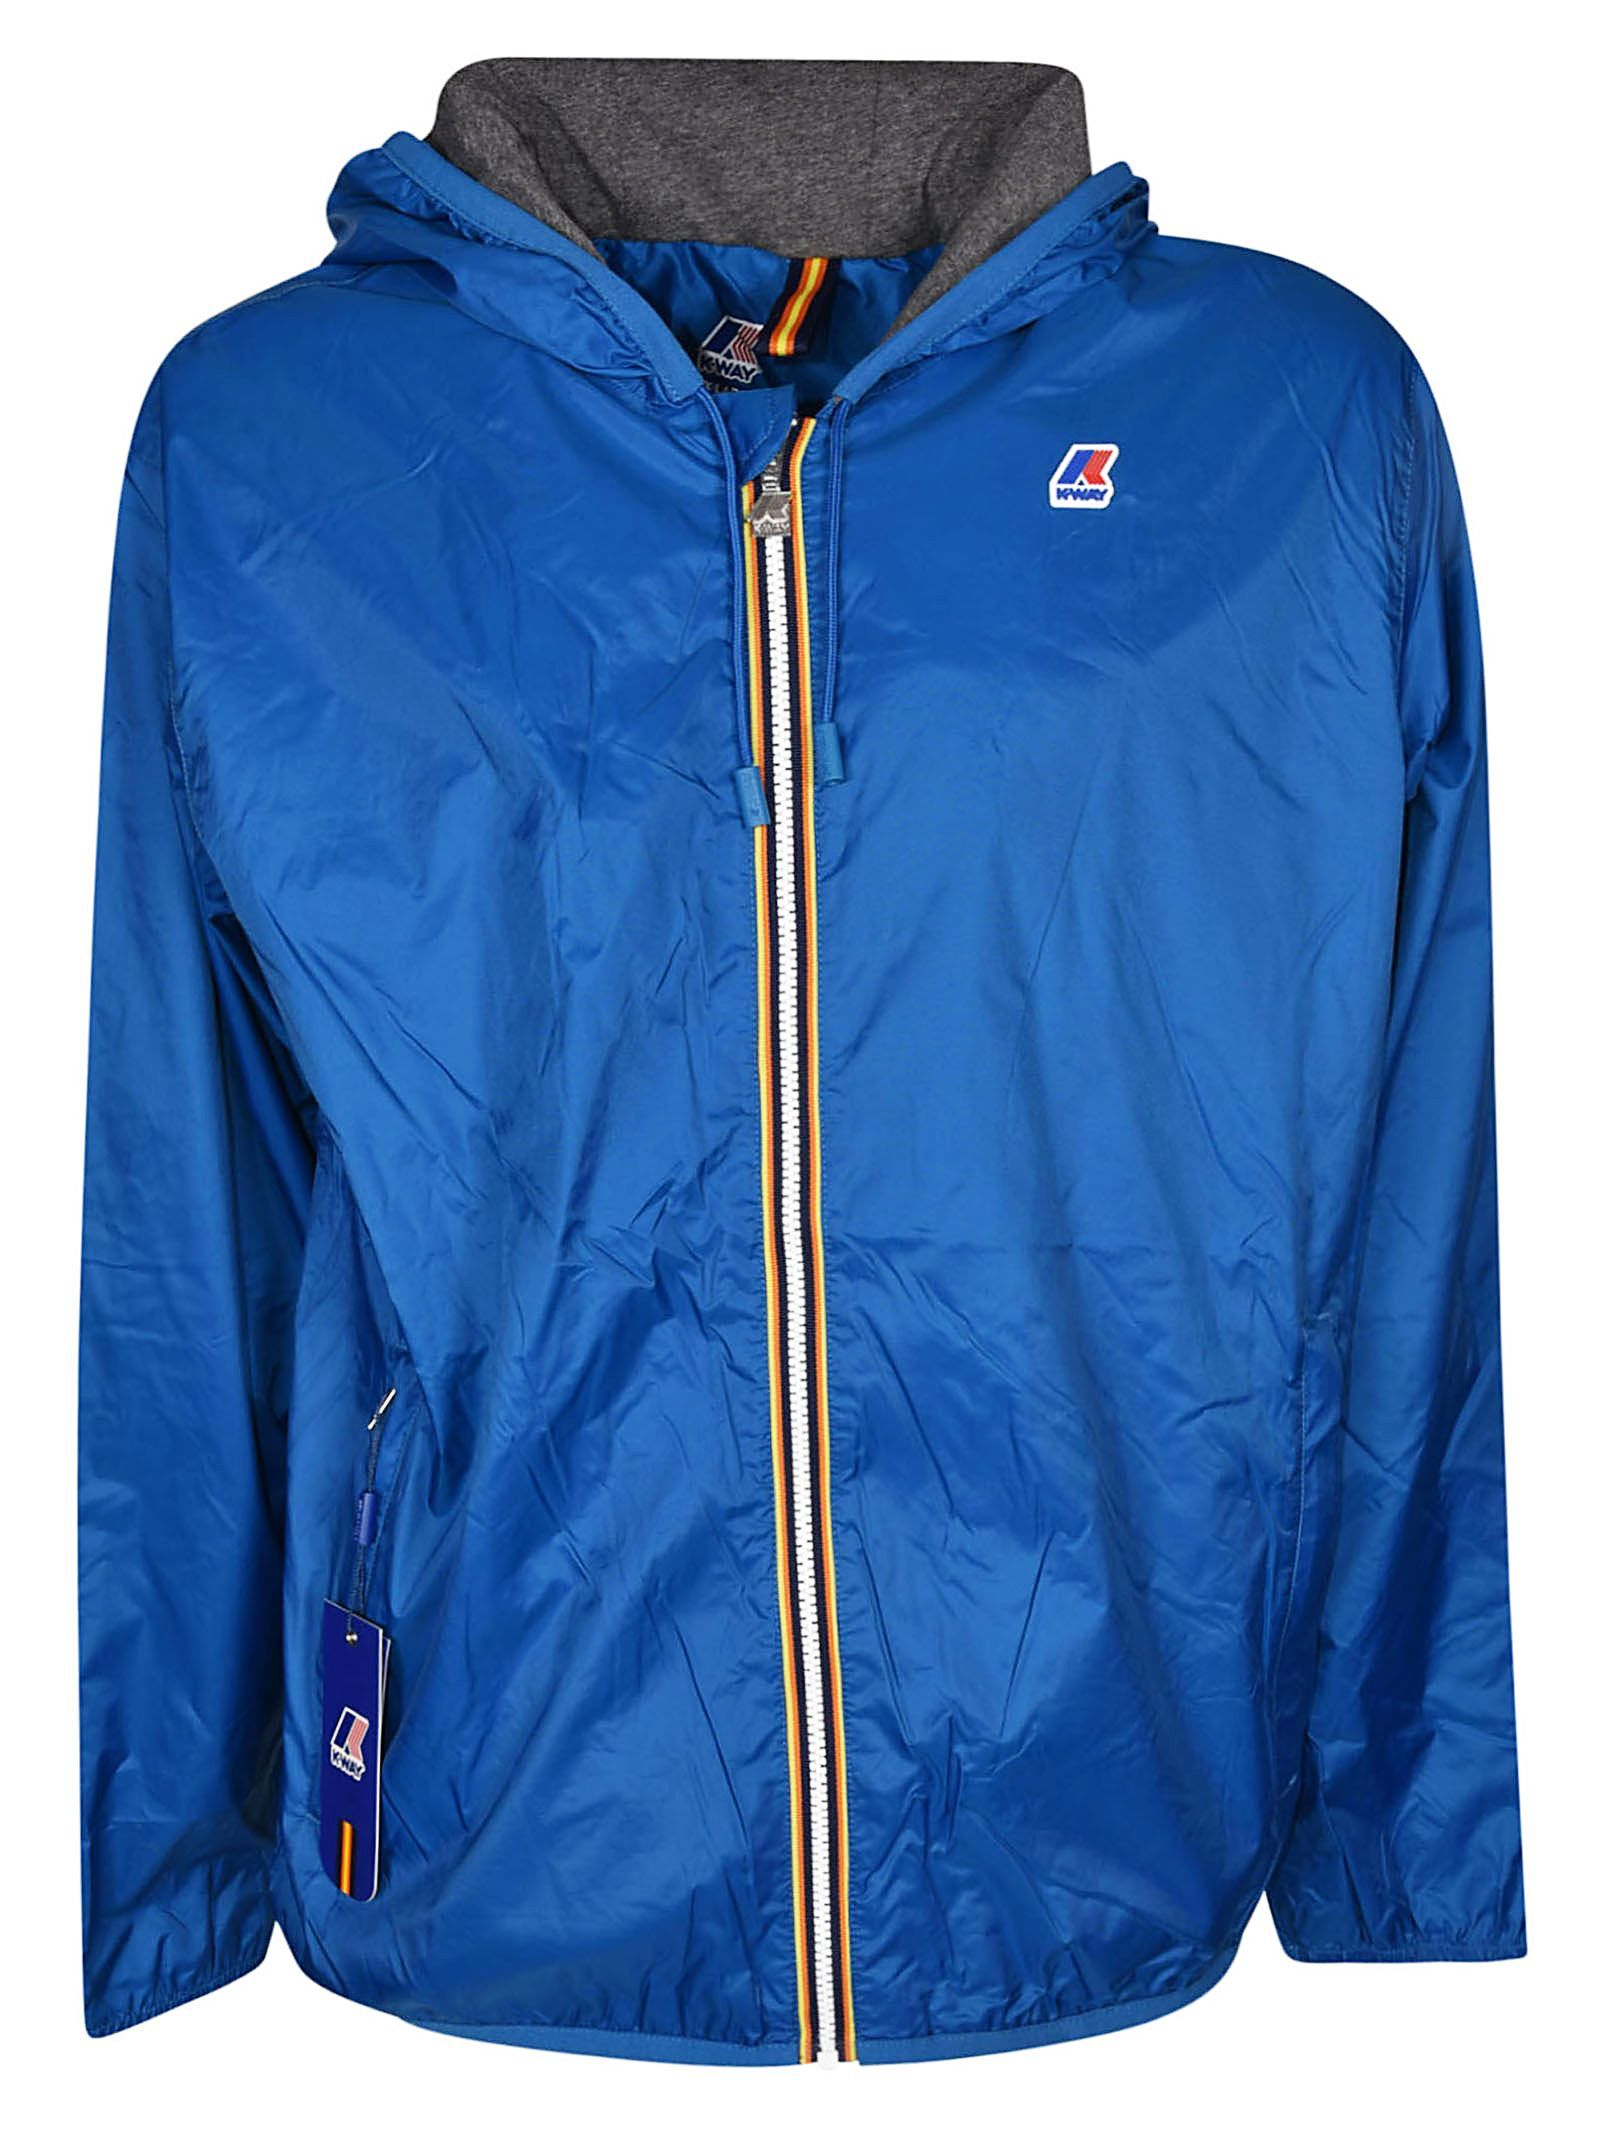 Jacket In Blue Jackets, Zip jackets, Leather jacket